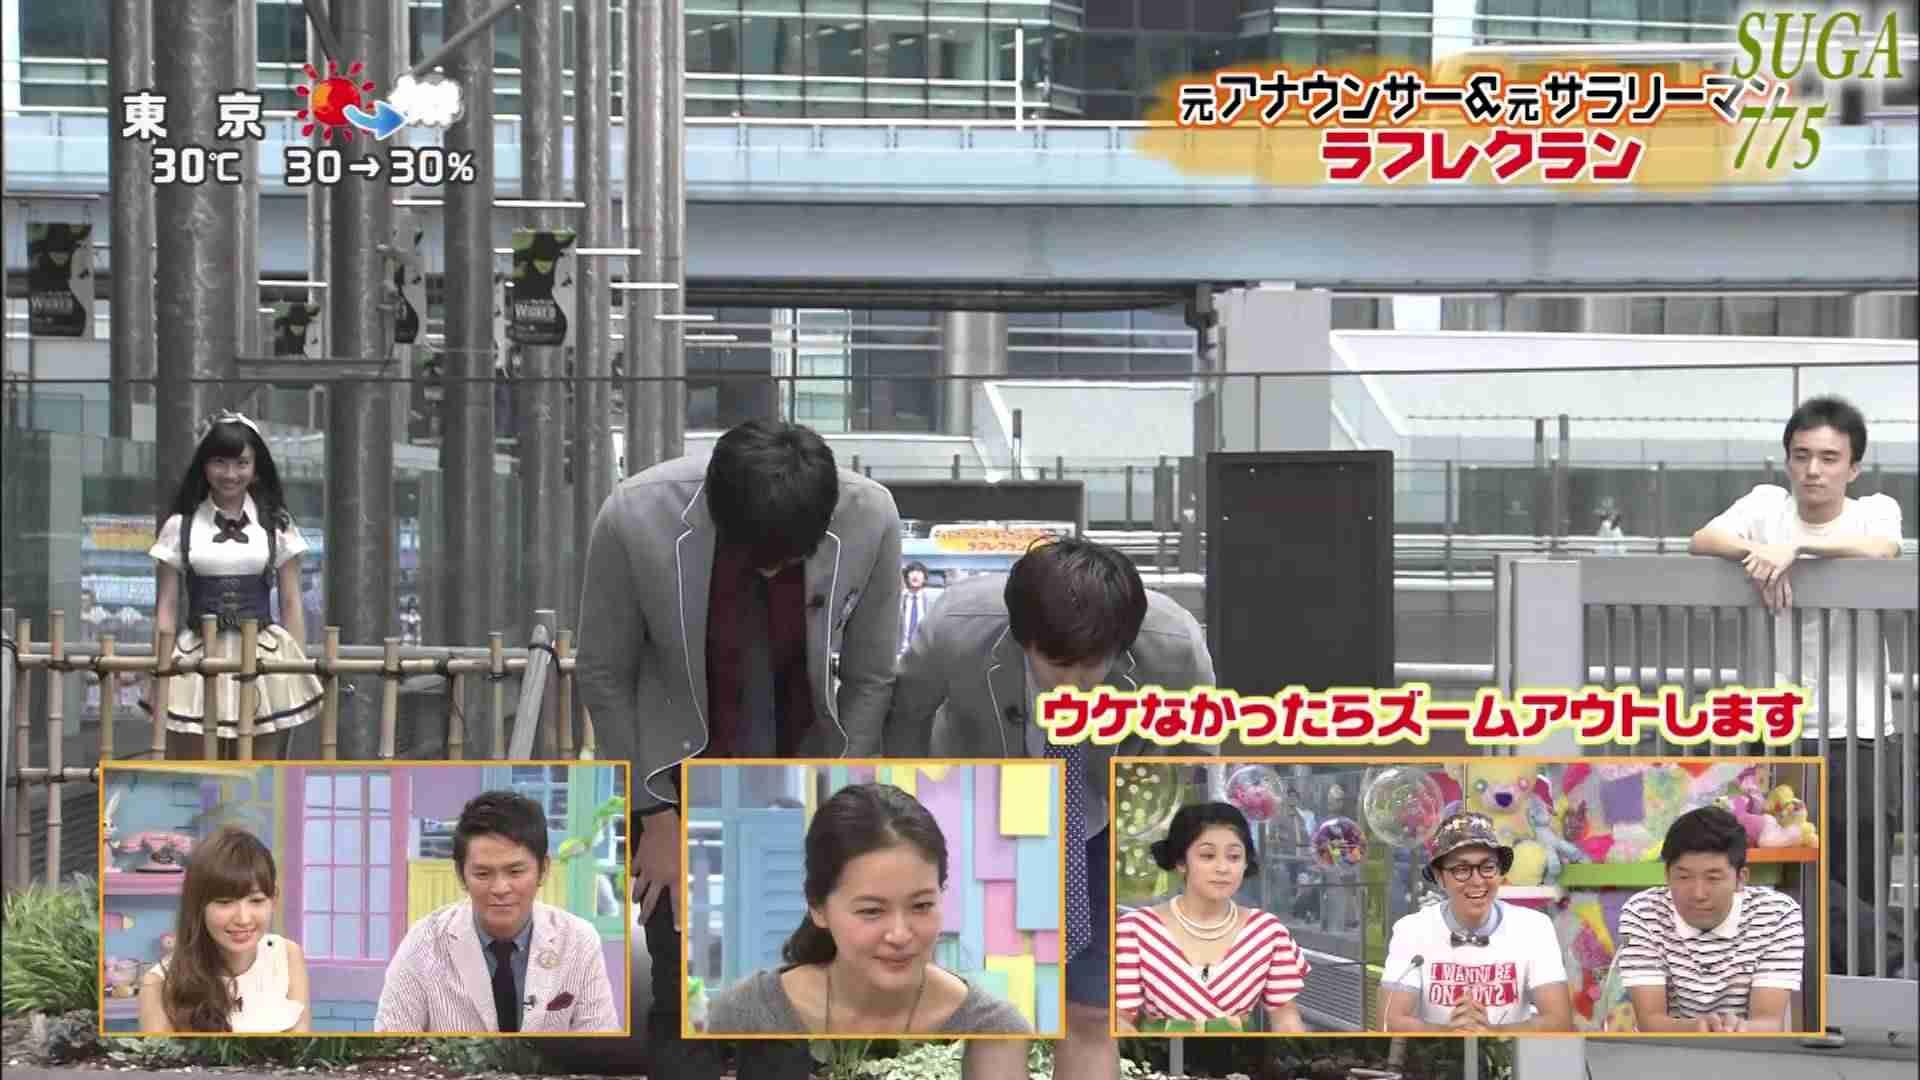 SKE48 柴田阿弥 が『PON!』 に映り込む 全出演シーン抜粋 AKB48 小嶋陽菜 苦笑い NMB48 HKT48 - YouTube